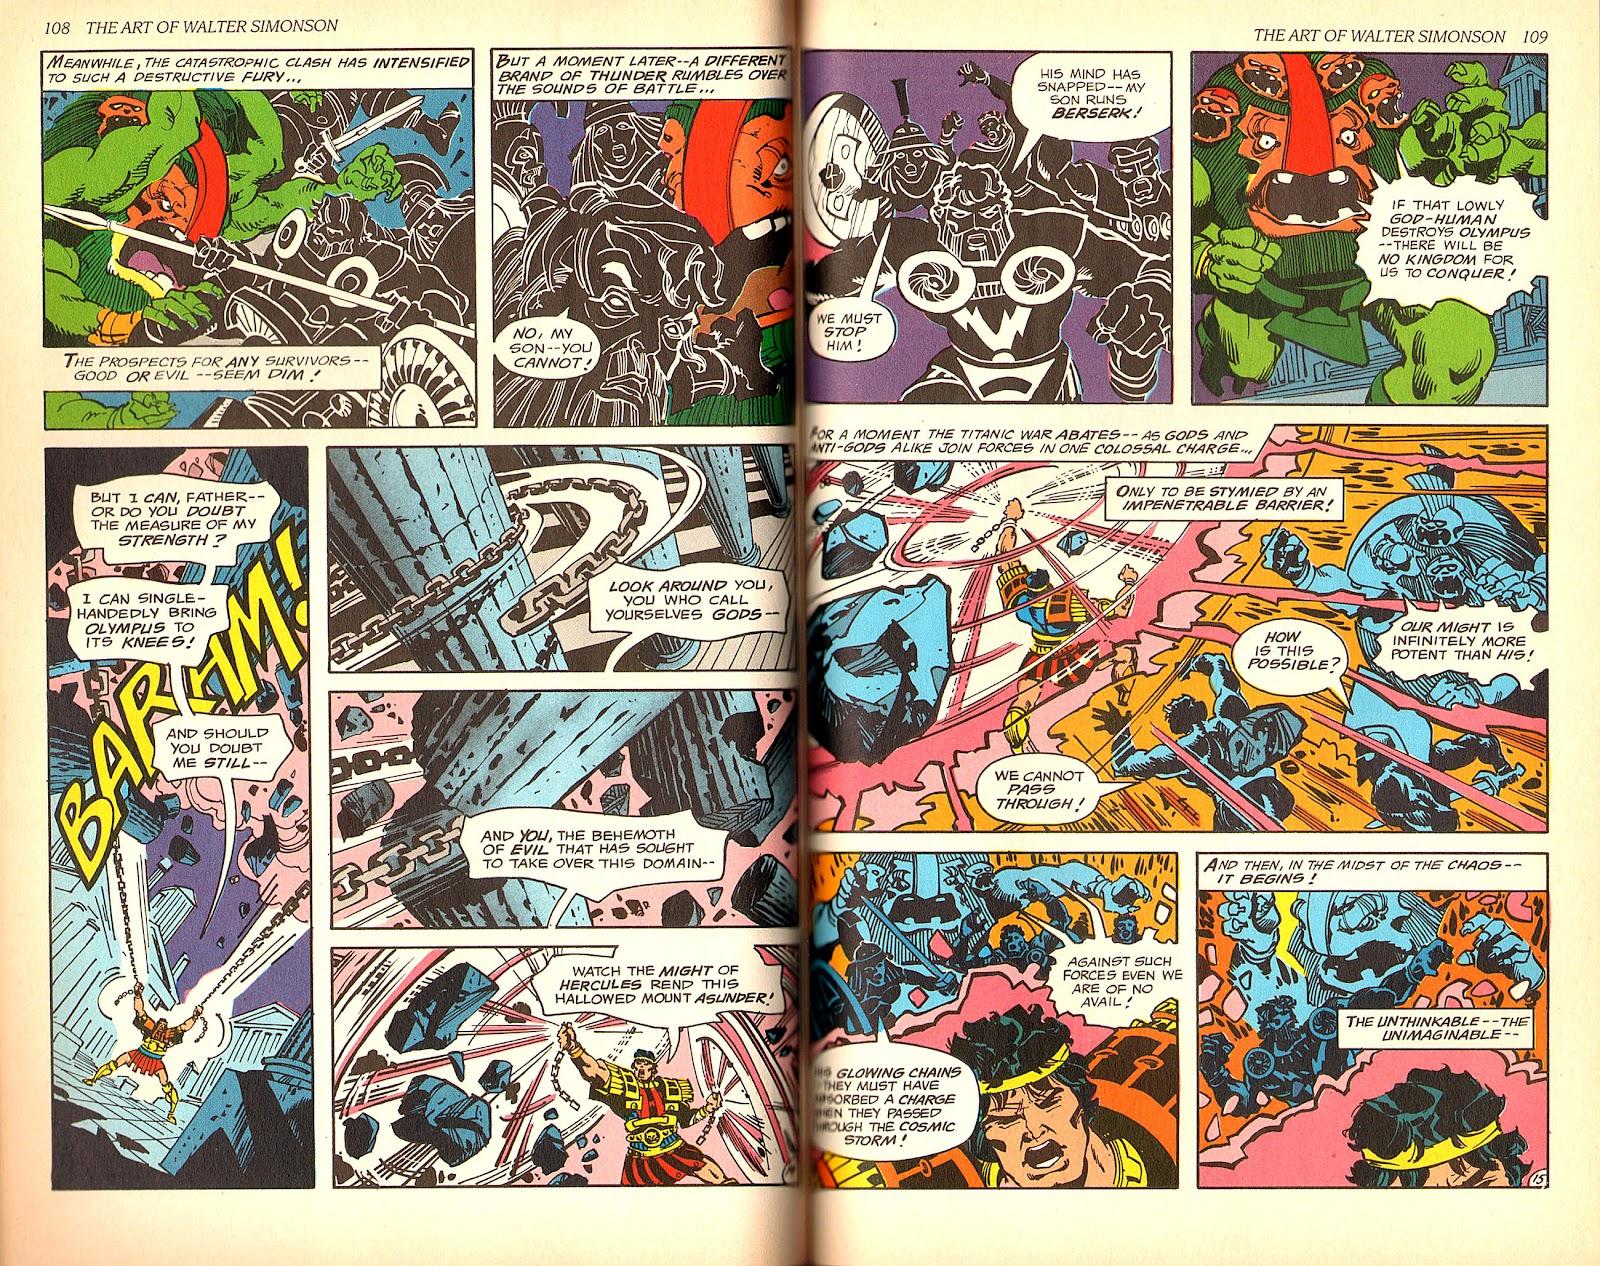 Read online The Art of Walter Simonson comic -  Issue # TPB - 56